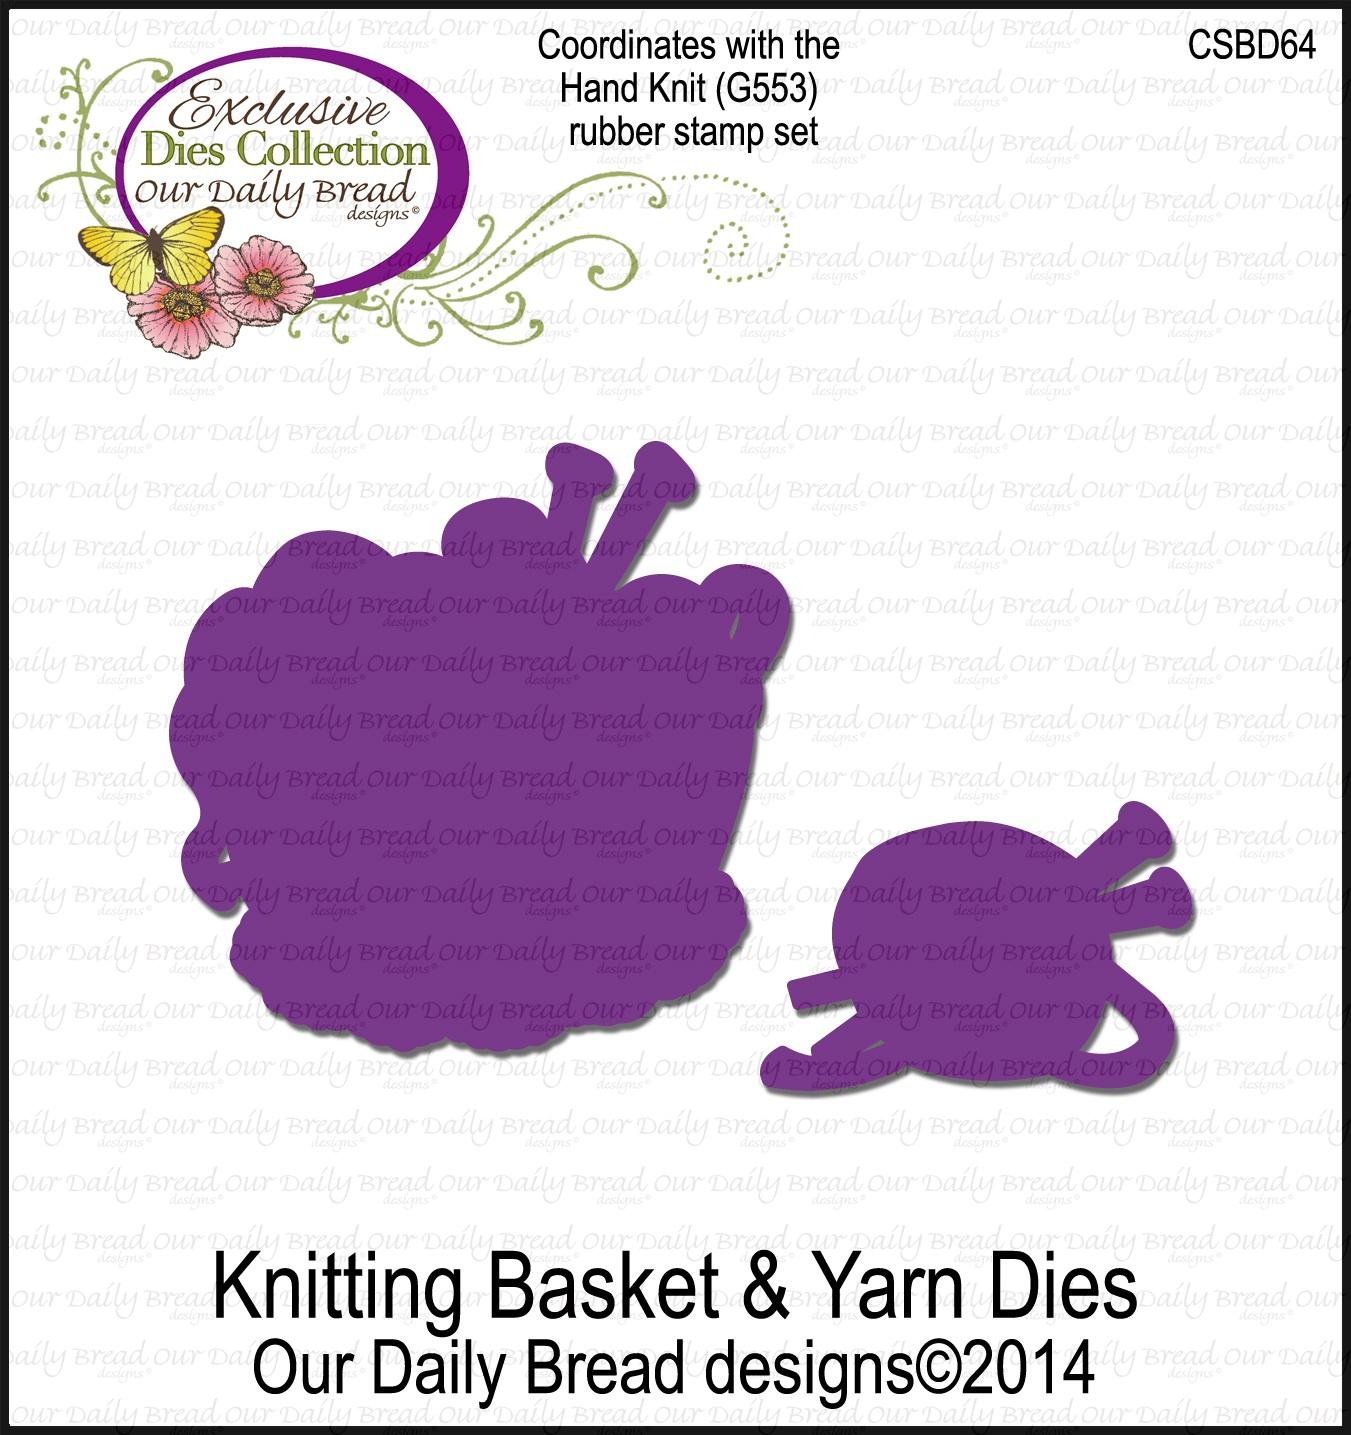 https://www.ourdailybreaddesigns.com/index.php/csbd69-knitting-basket-yarn-dies.html